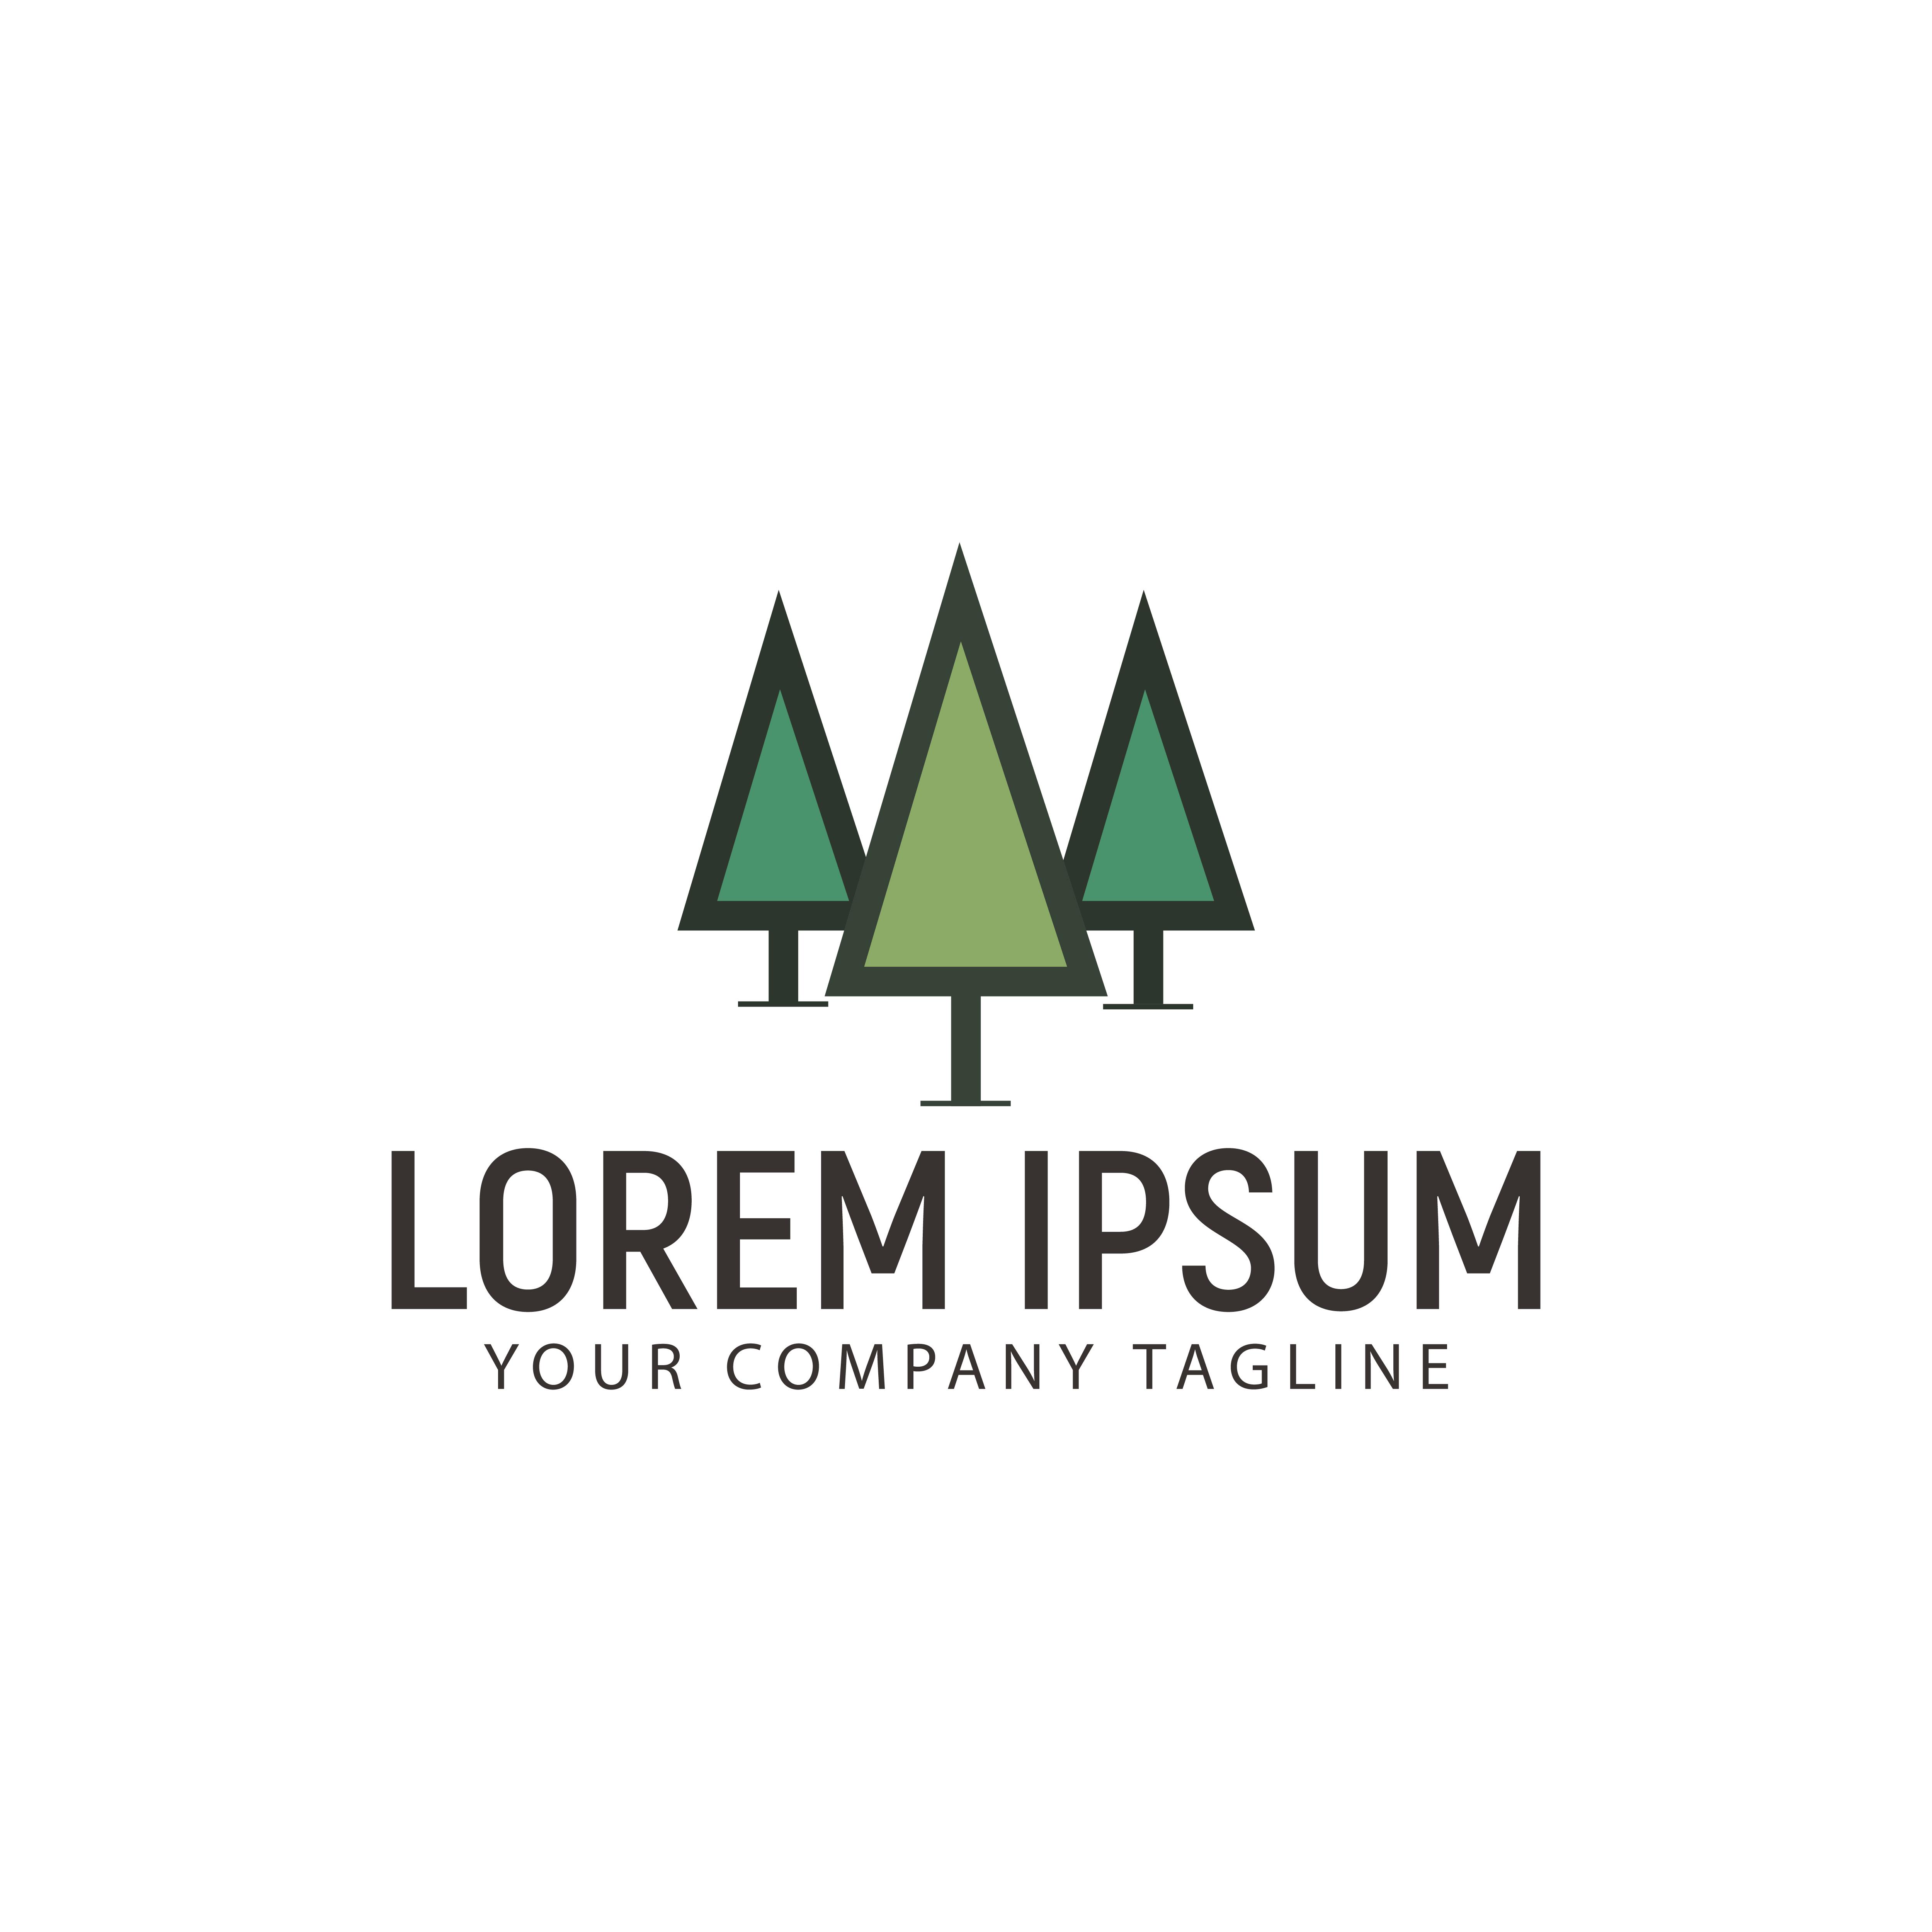 Minimalist Tree Logo Design Concept Template